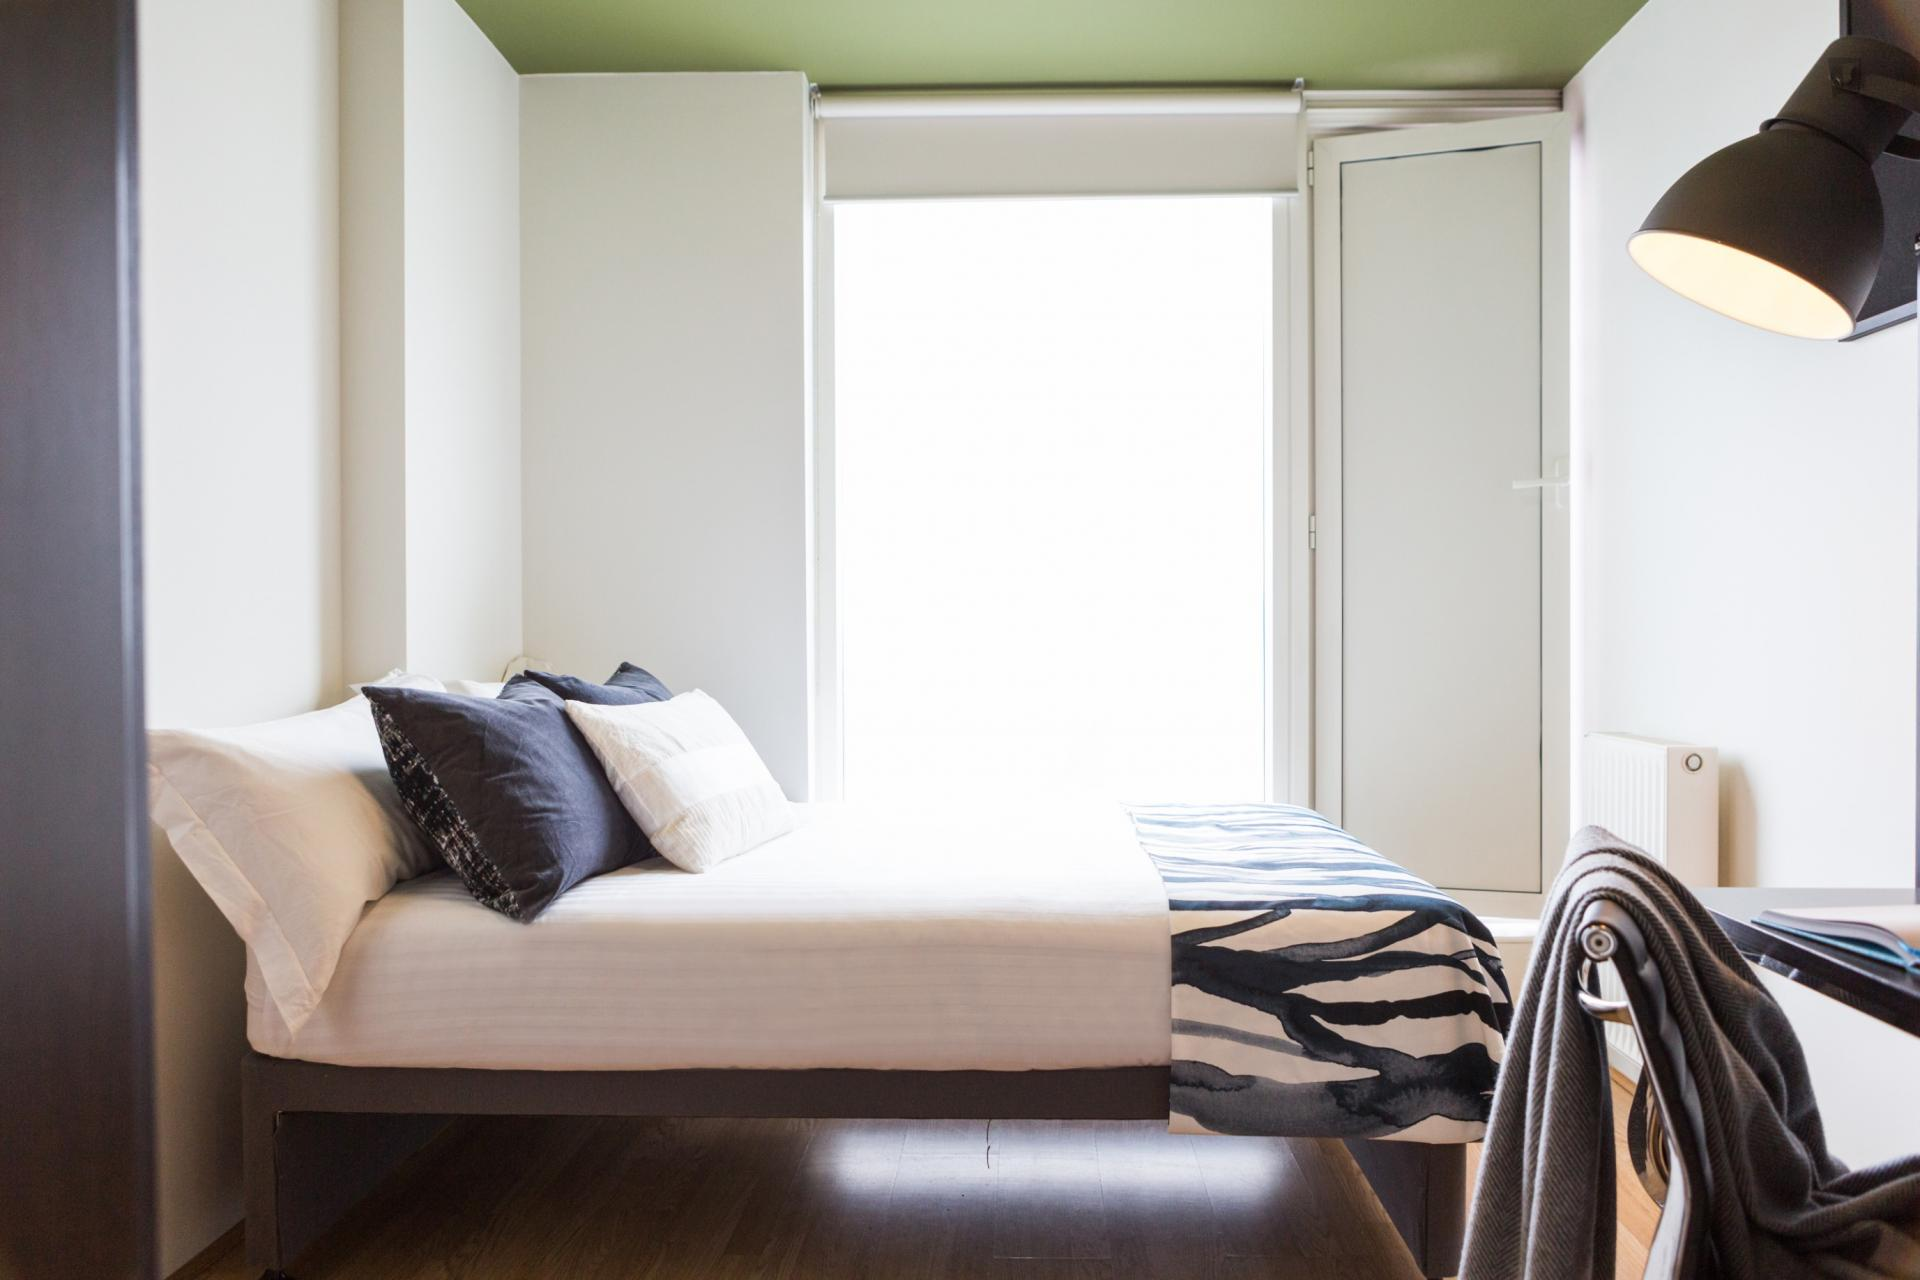 Liverpool - Single bedroom in London